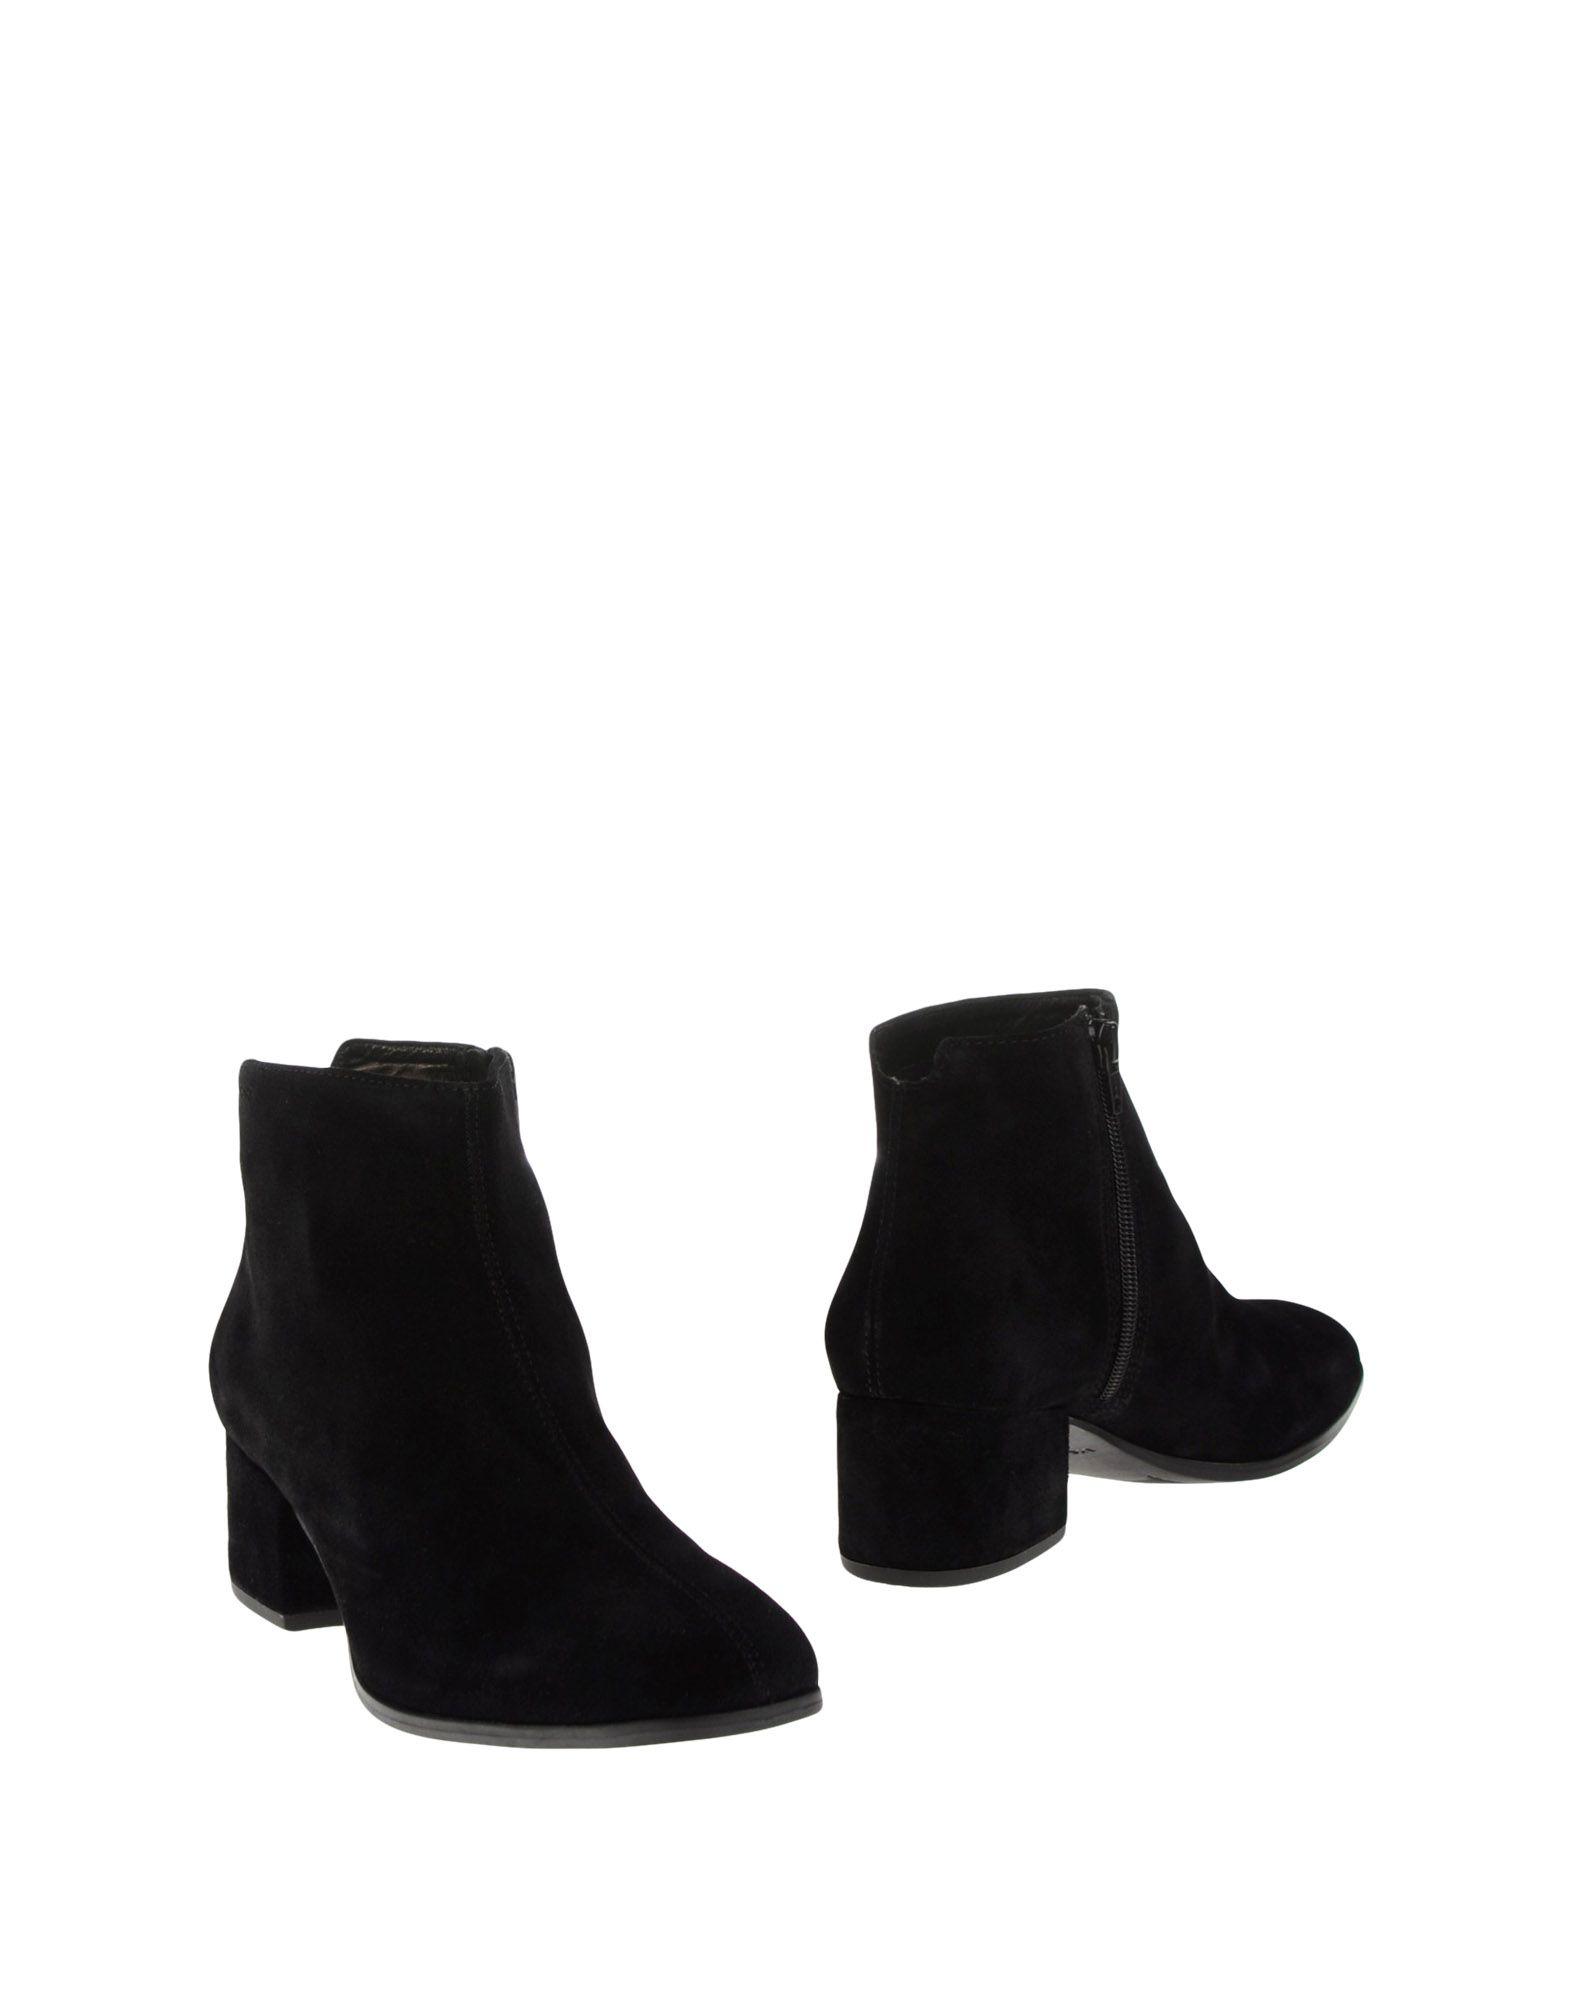 Vagabond Shoemakers Stiefelette Damen  Schuhe 11239439GT Gute Qualität beliebte Schuhe  2c0b17